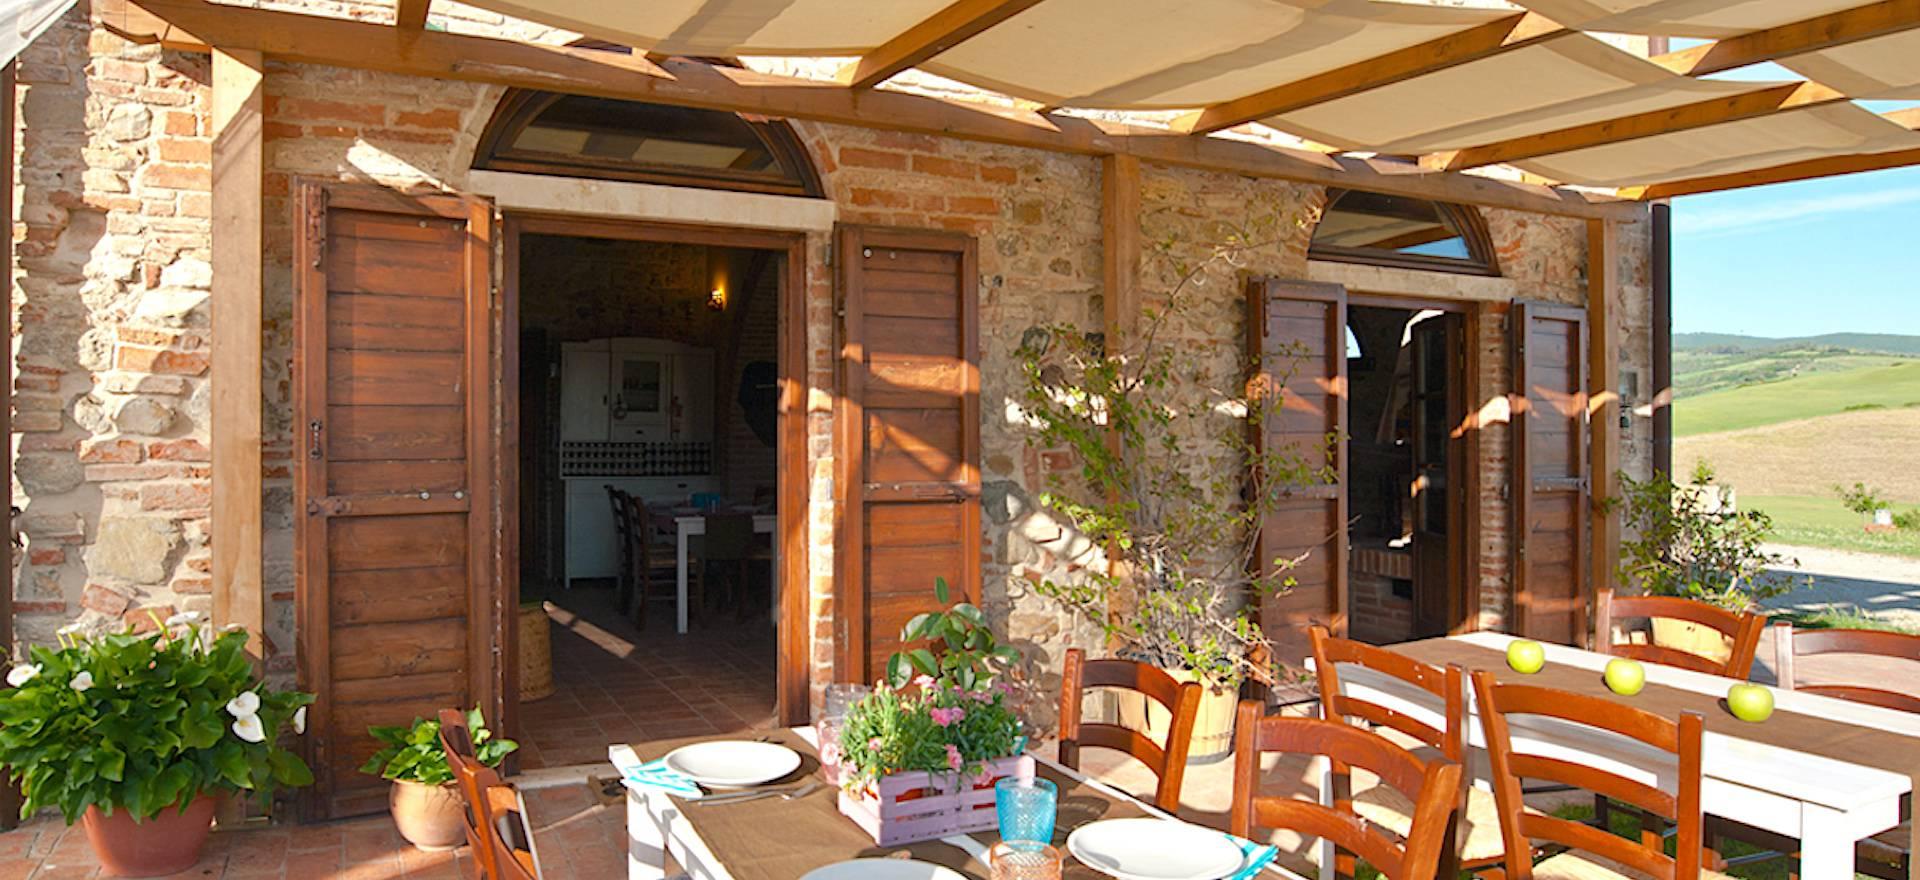 Agriturismo Toscana Agriturismo accogliente con vista su Volterra, Toscana